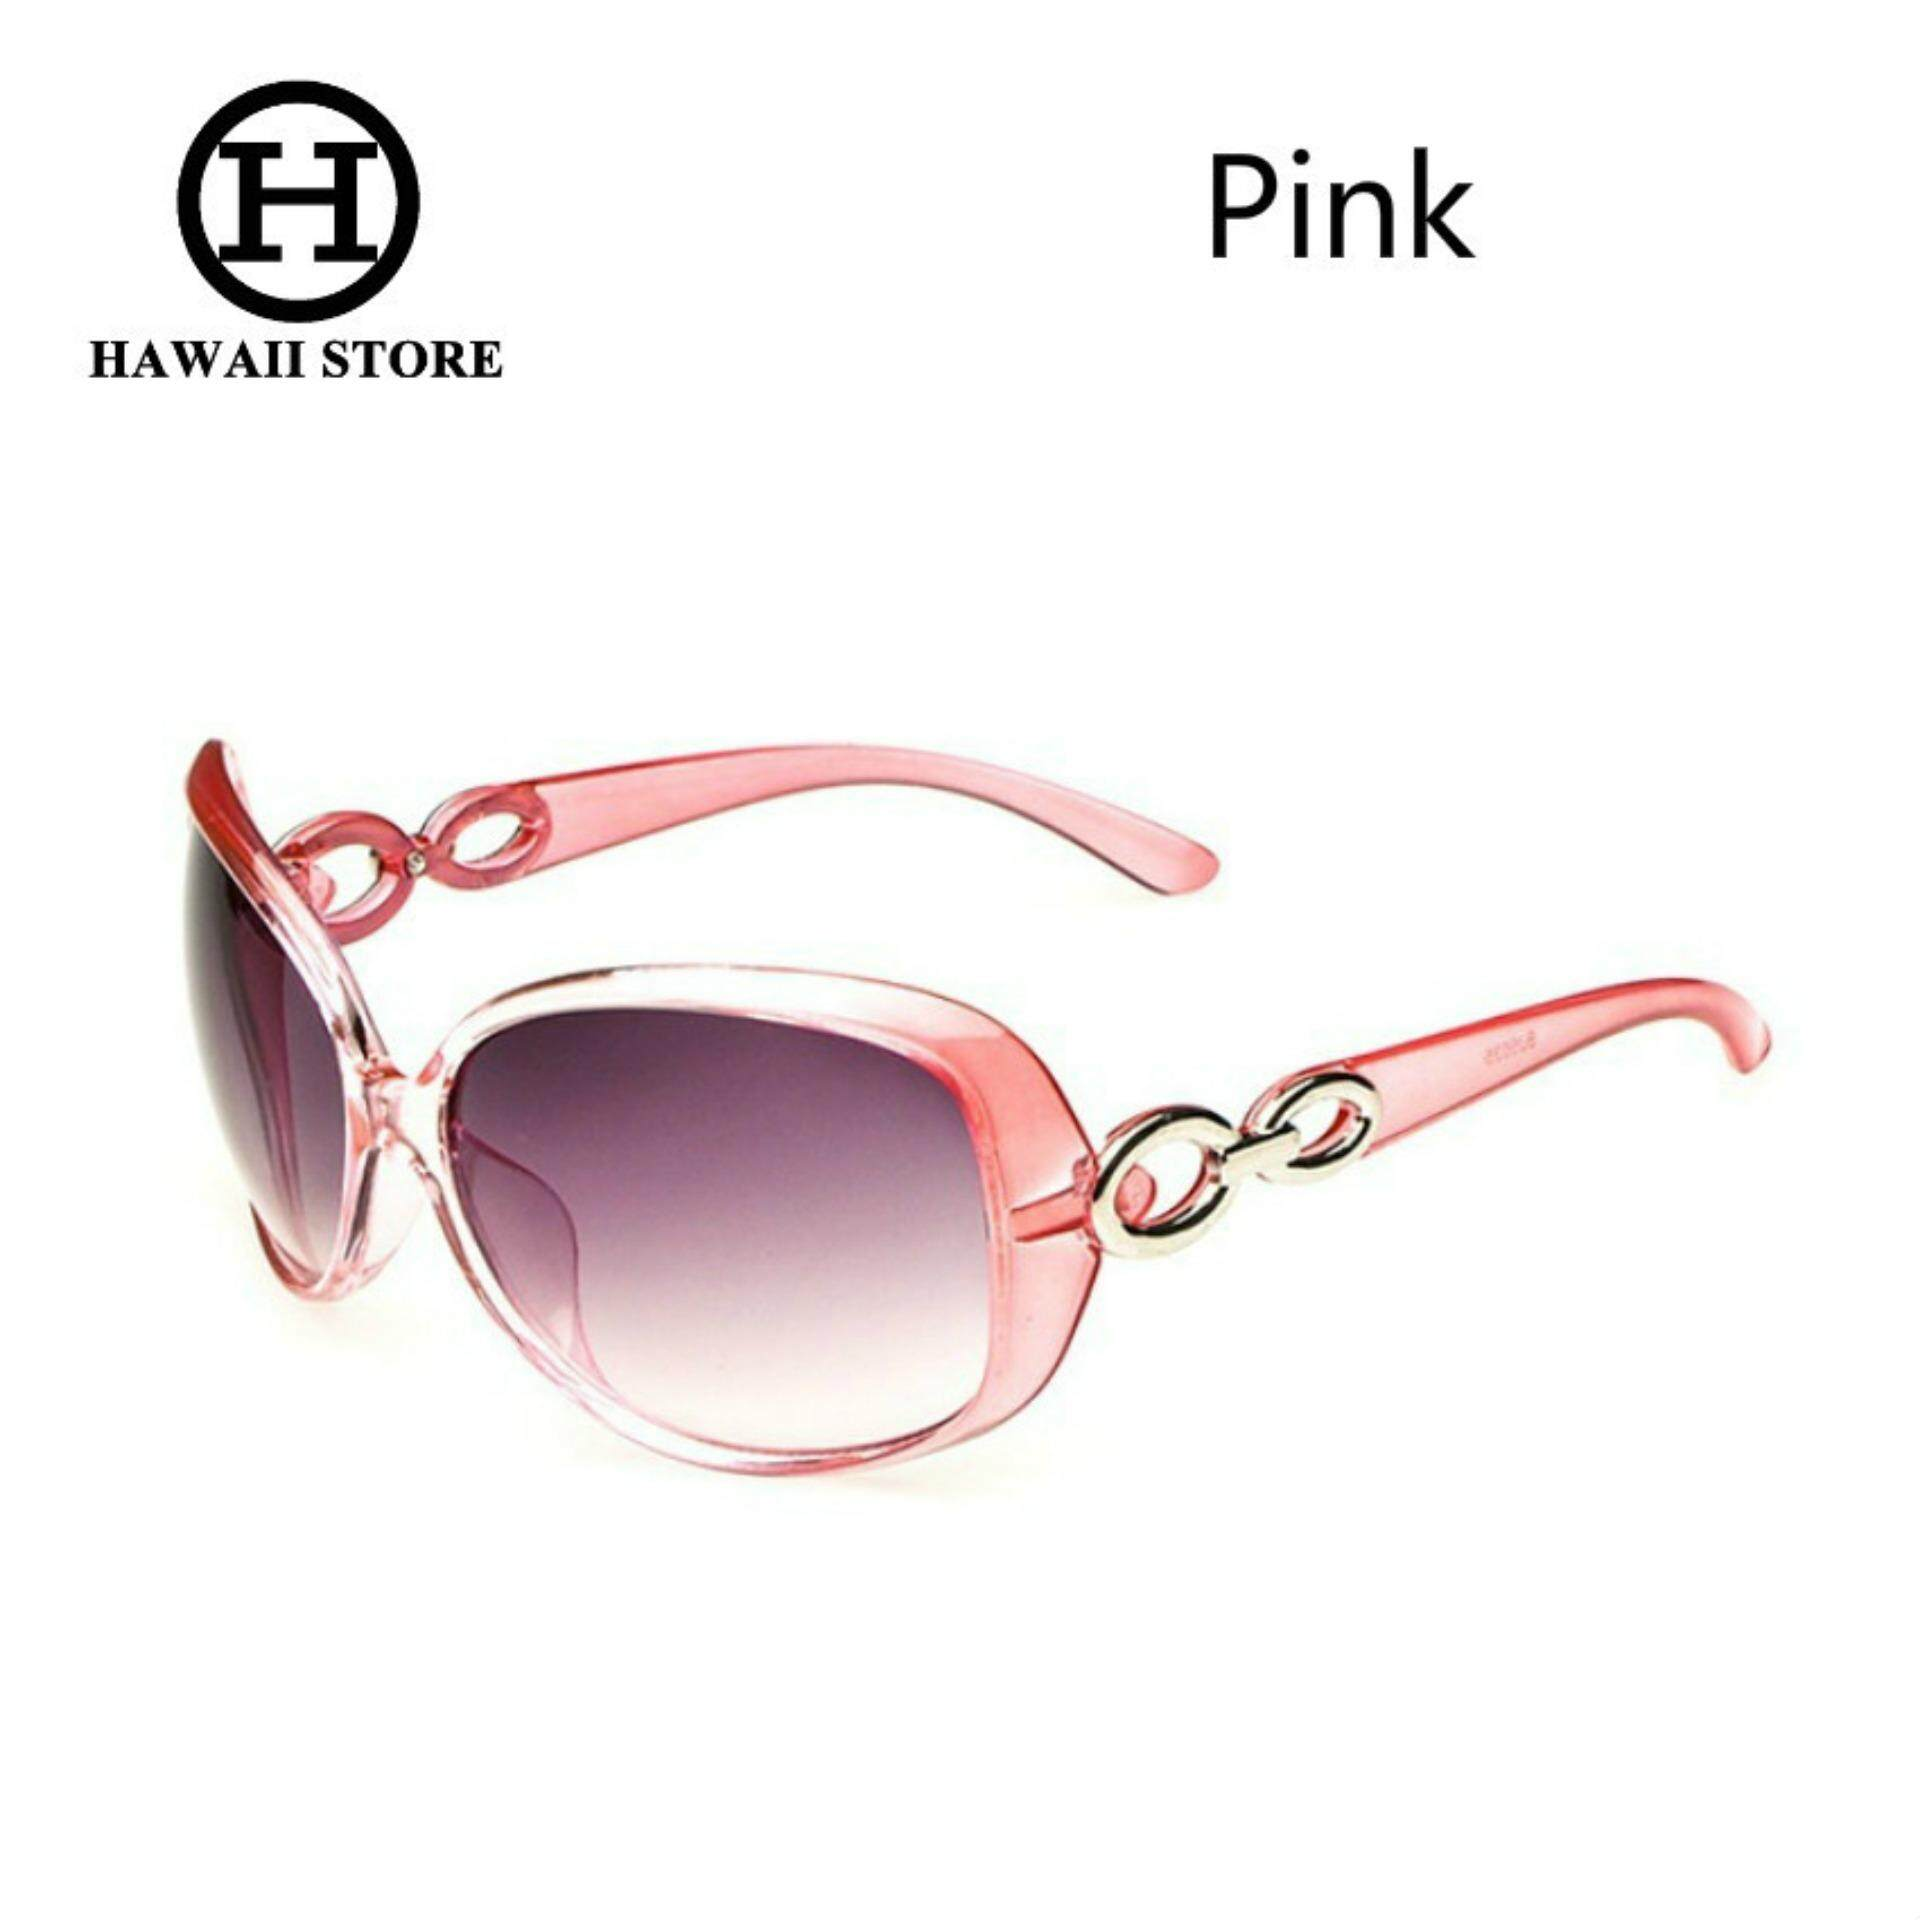 Terbaru Kacamata Wanita Wanita Kacamata Merk Desainer Asli Kacamata Hitam Fashion untuk Anak Perempuan dan Wanita